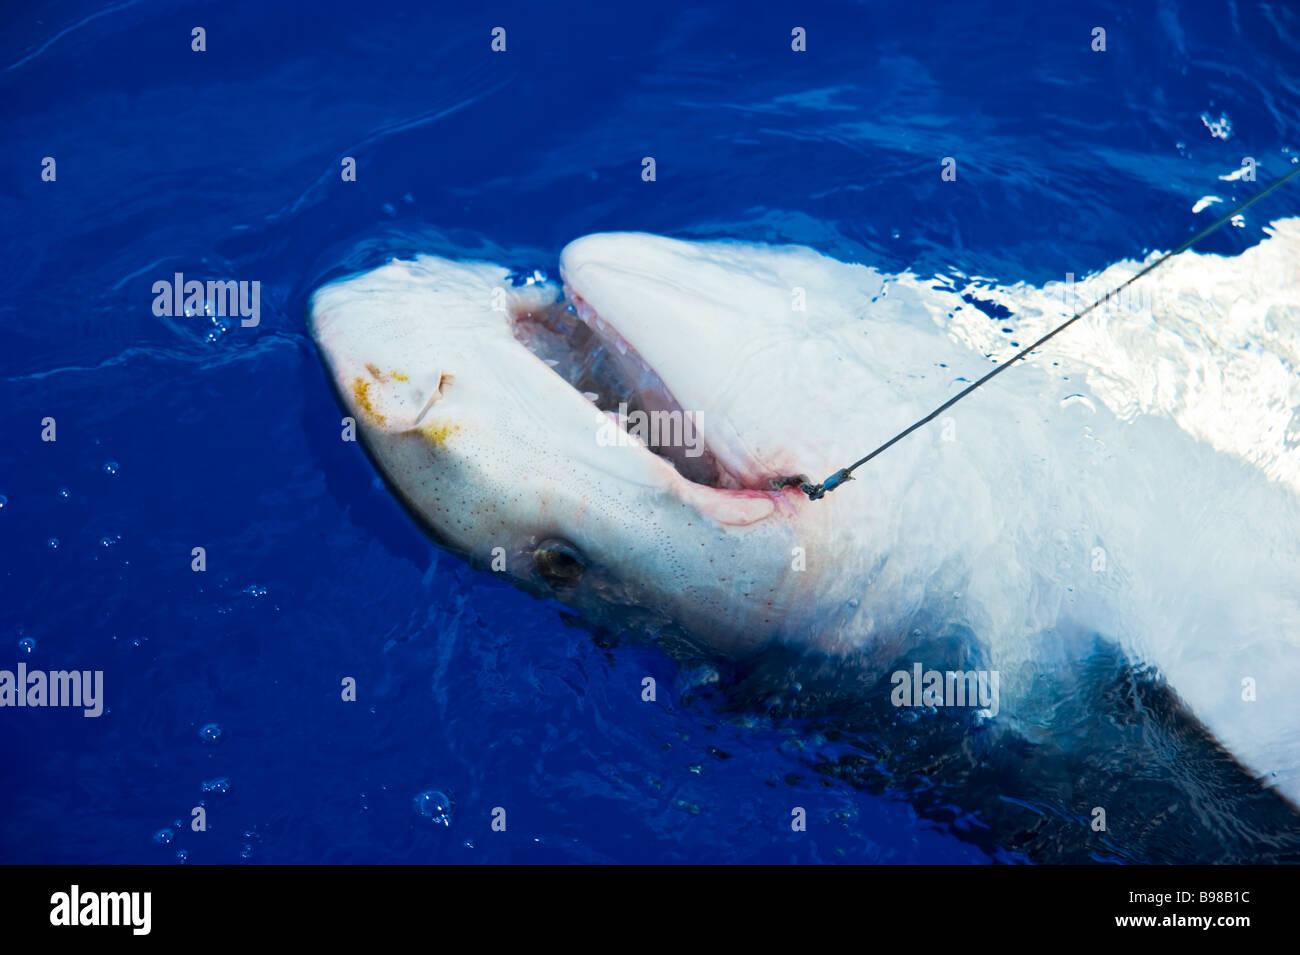 Catch of tiger shark big game fishing La Reunion France   Tigerhai, Fang am Haken, Hochseeangeln, La Reunion Stock Photo